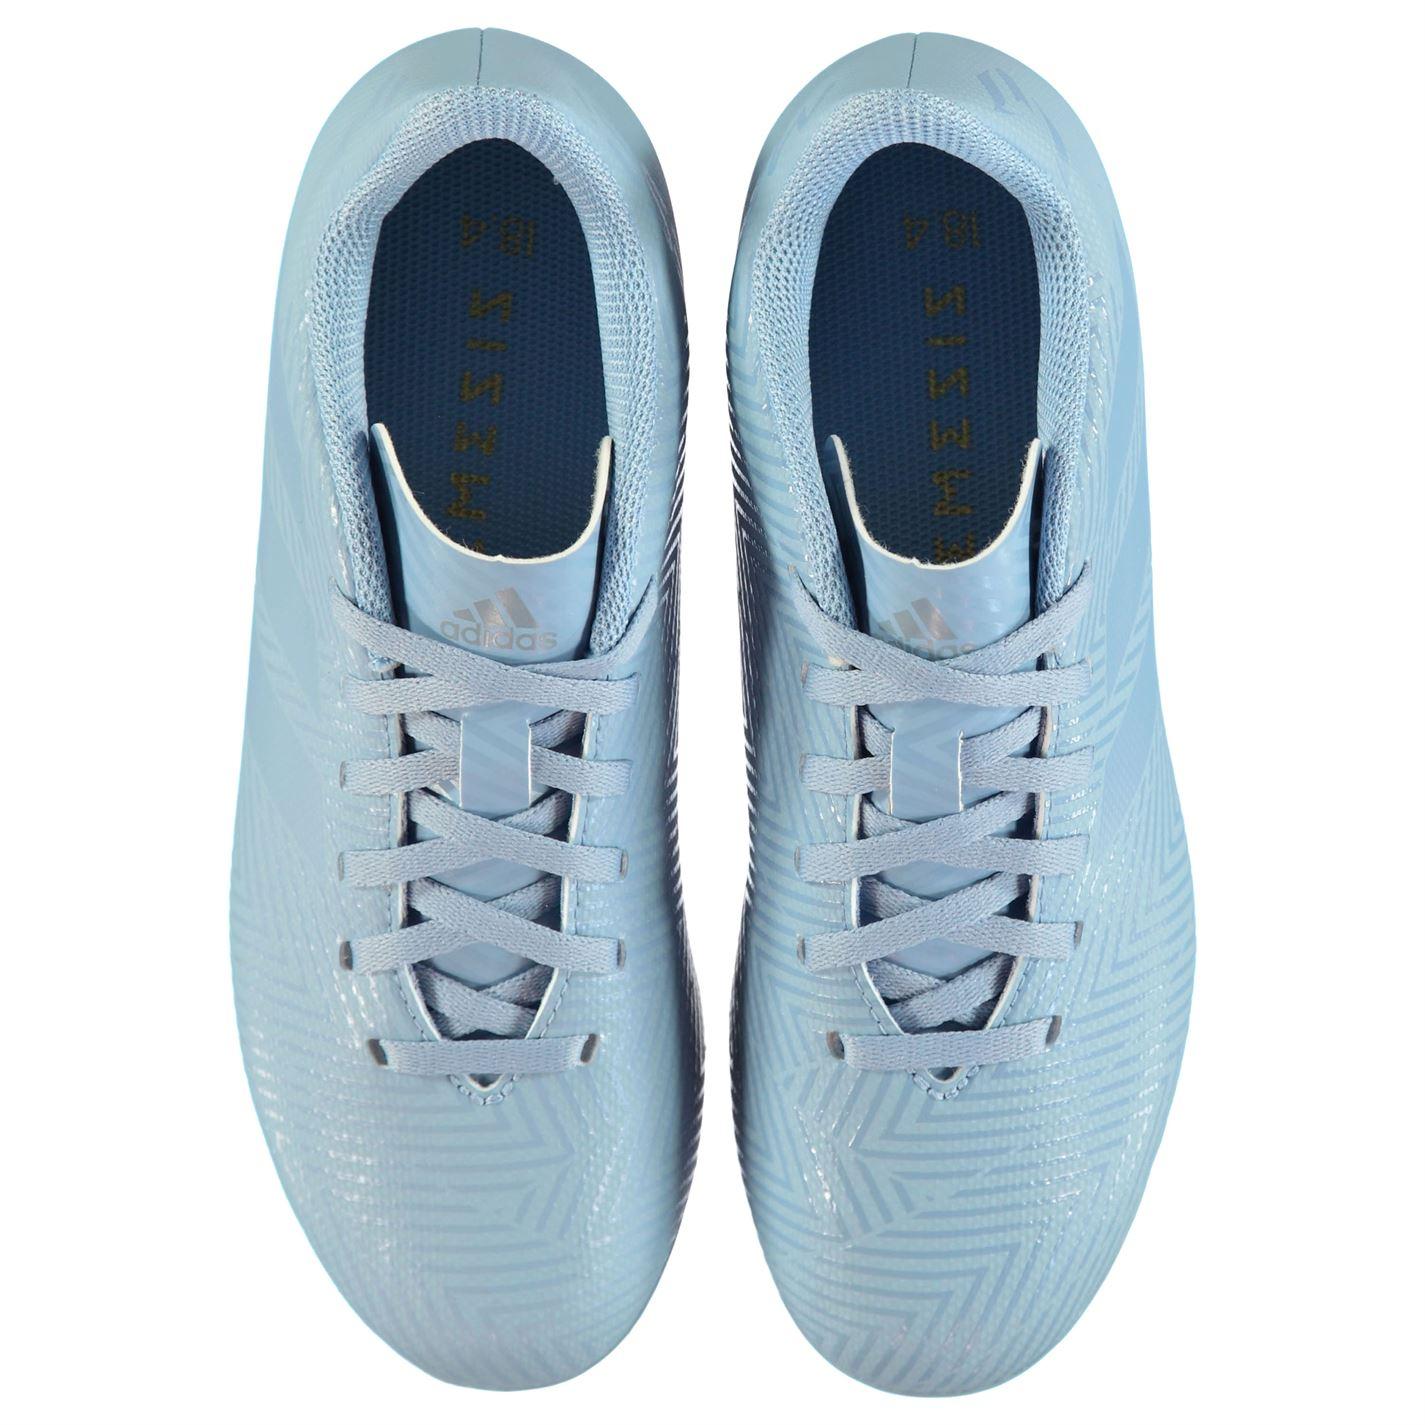 Adidas-Kids-Boys-Nemeziz-Messi-18-4-Junior-FG-Football-Boots-Firm-Ground-Lace-Up thumbnail 5